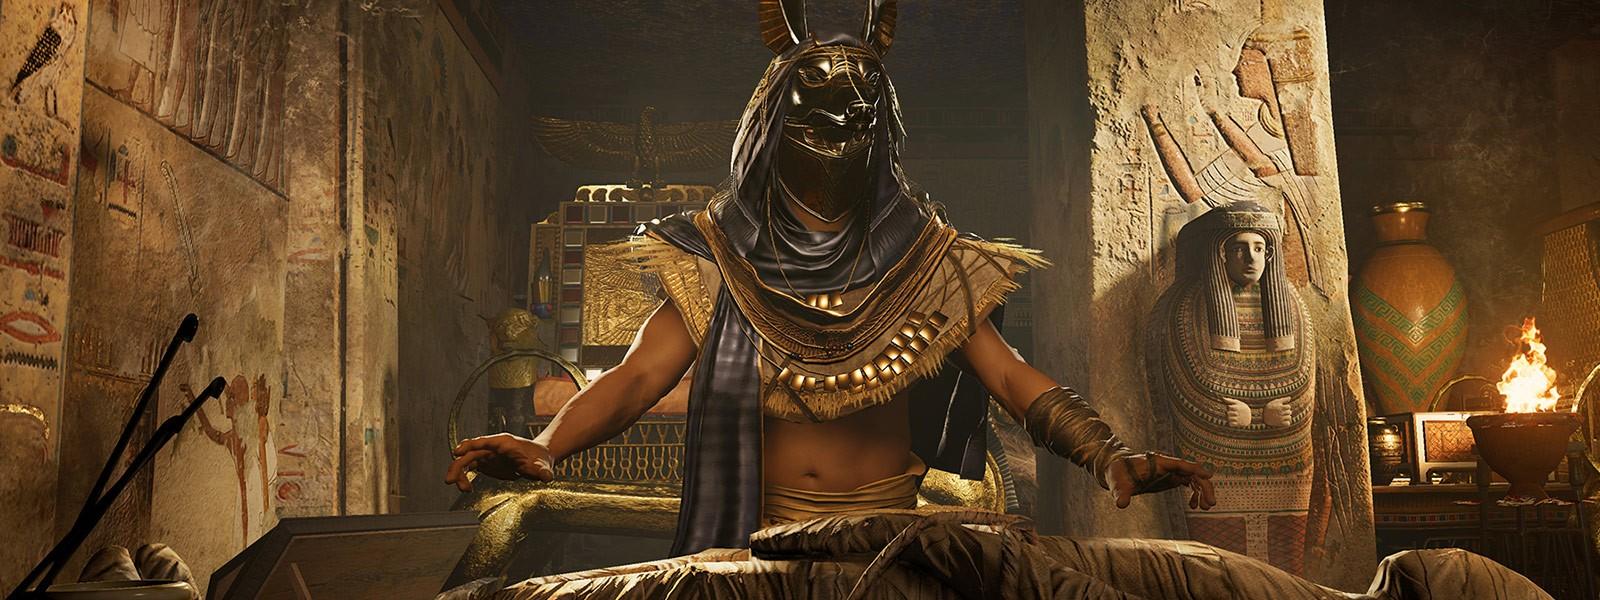 Egypt Warrior Illustration Anubis Pyramid Fantasy Art: Assassin's Creed: Origins